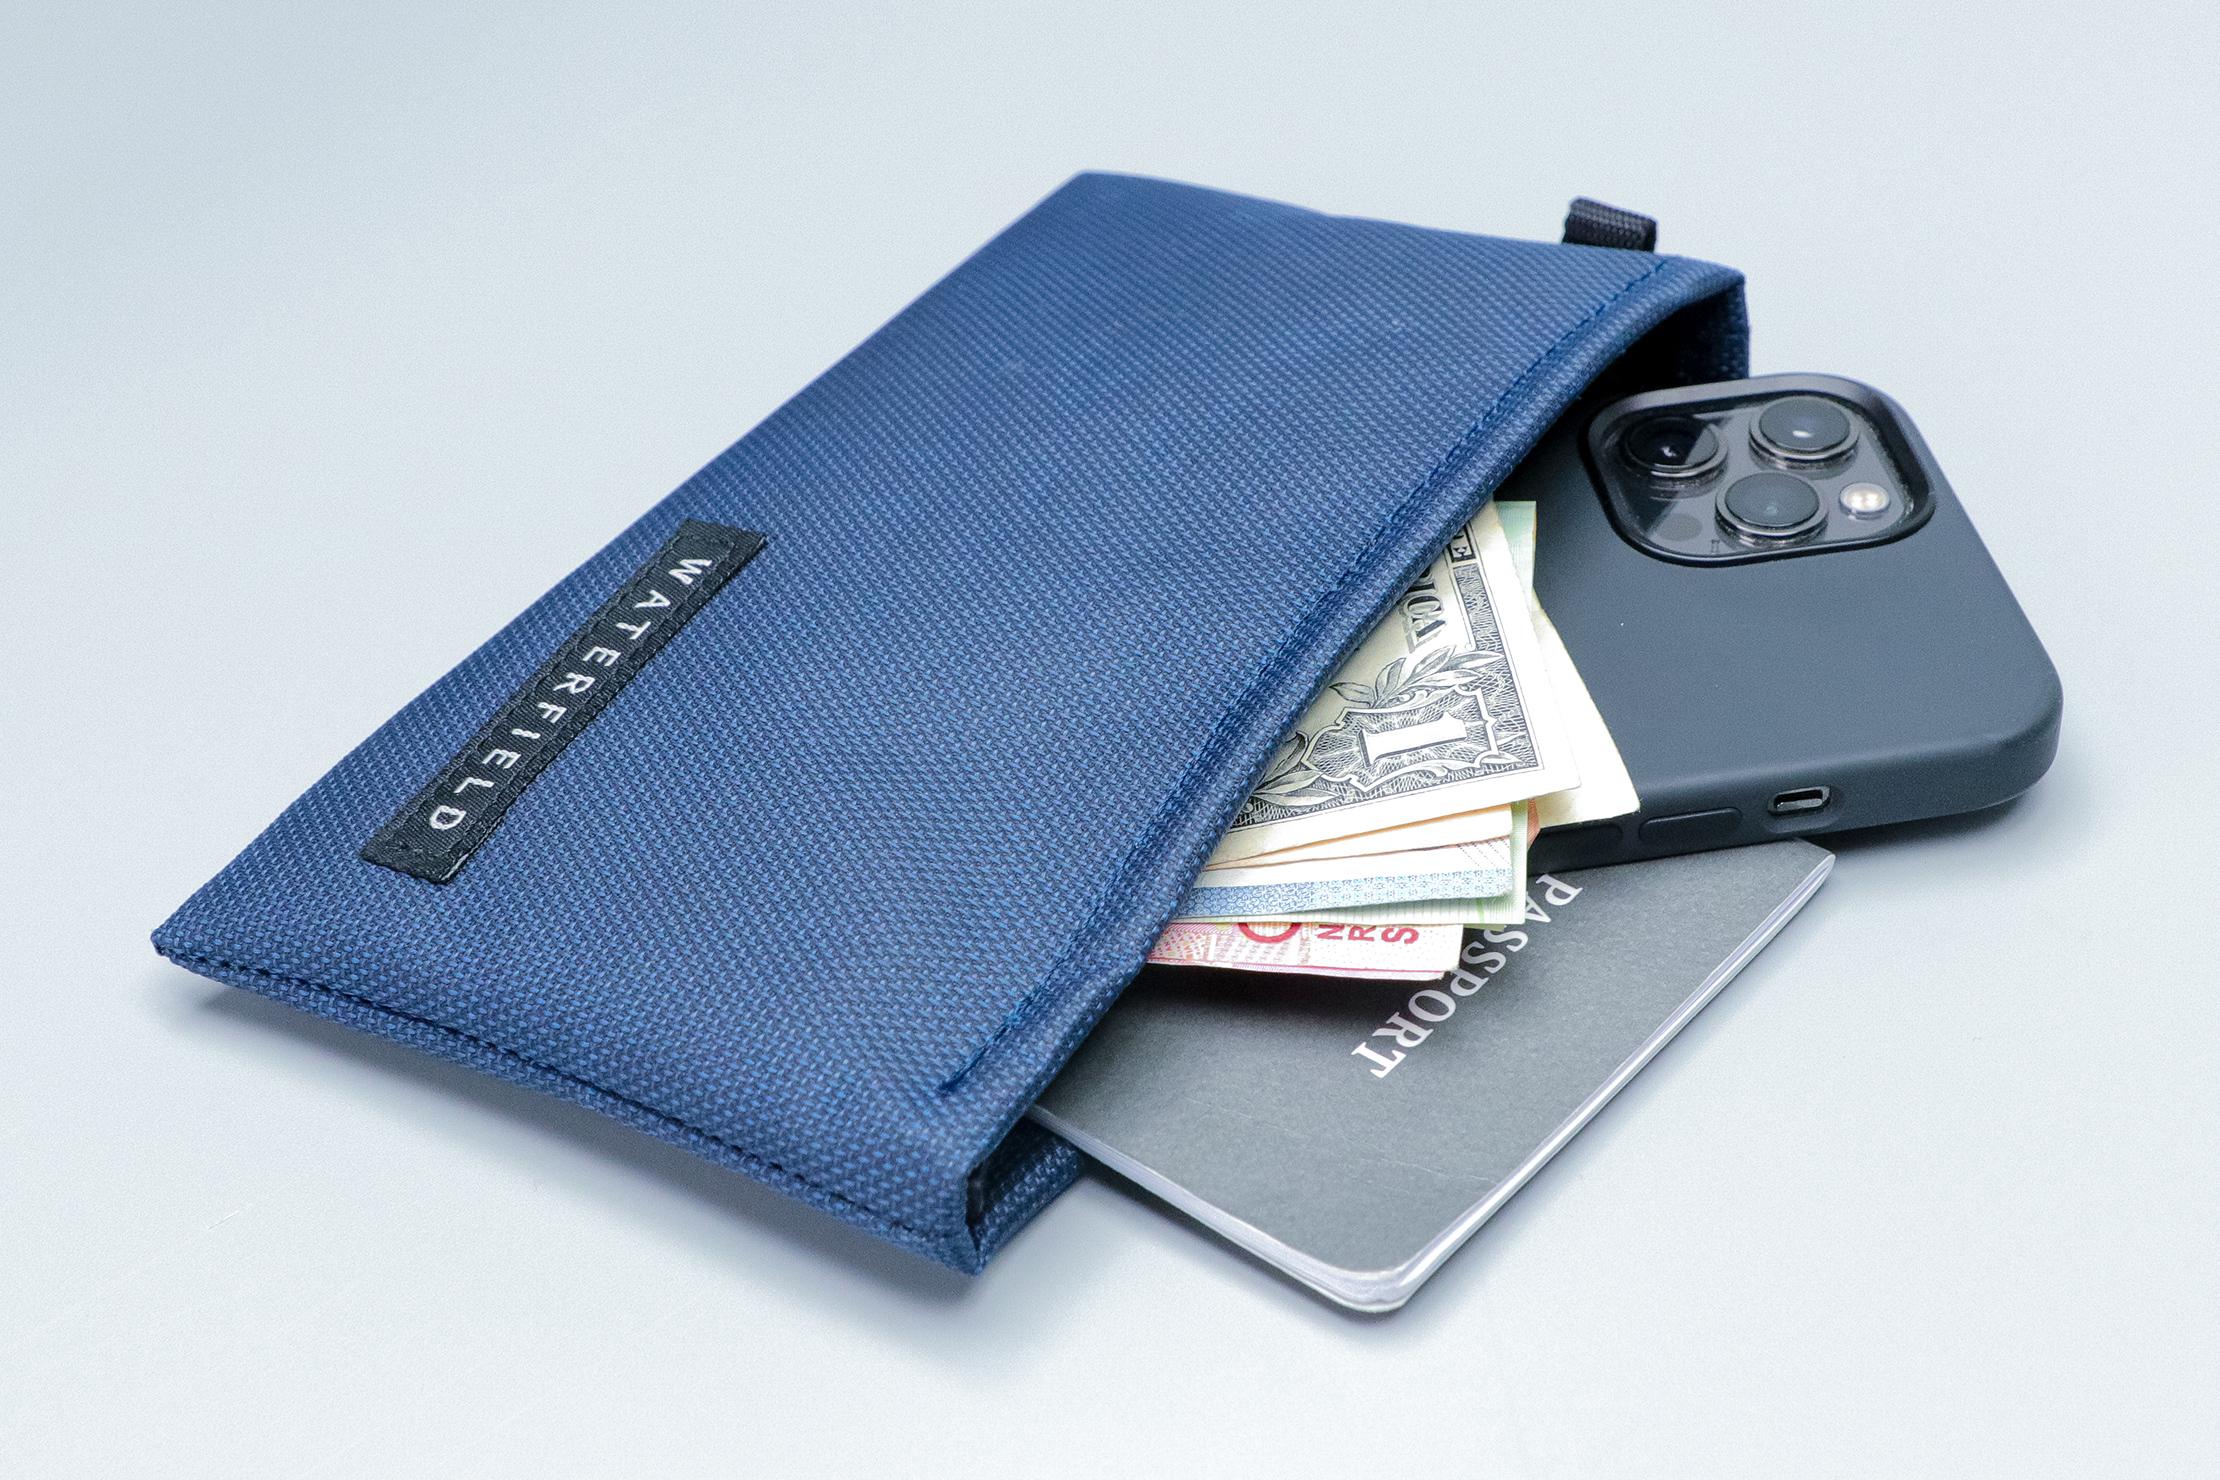 WaterField Designs Travel Wallet passport and phone